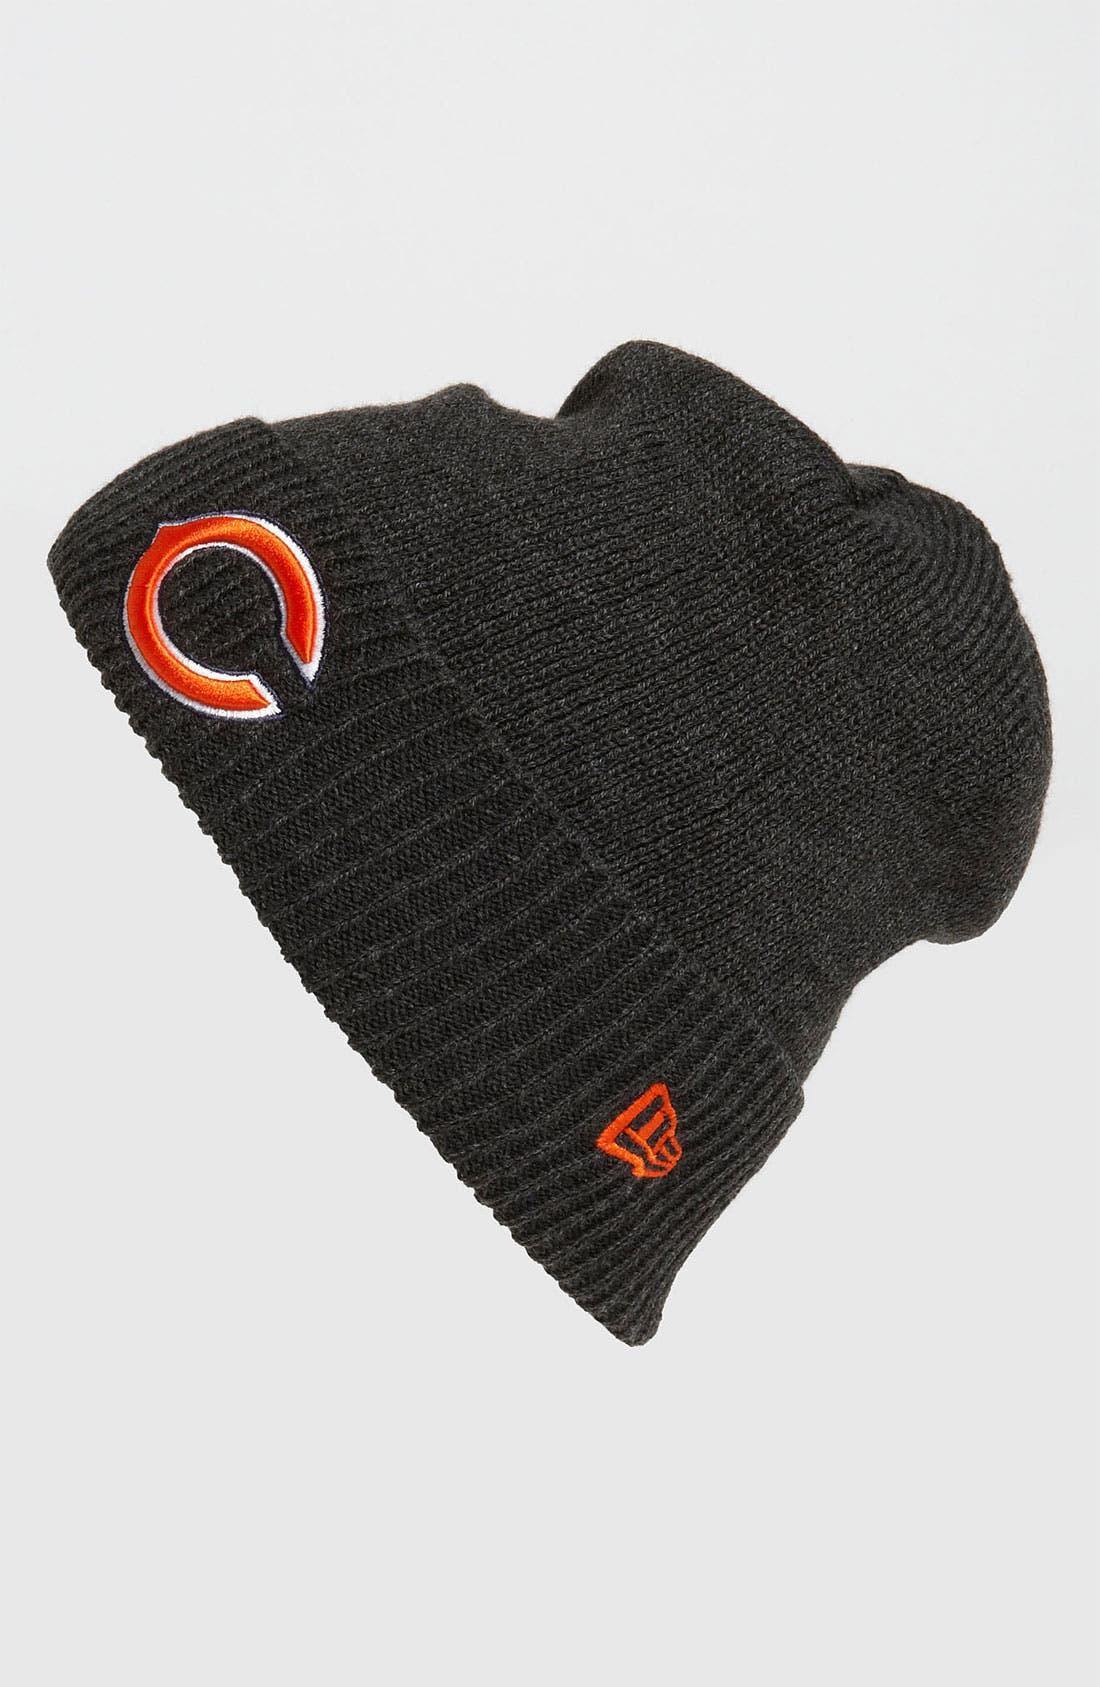 Alternate Image 1 Selected - New Era Cap 'Chicago Bears' Thermal Beanie